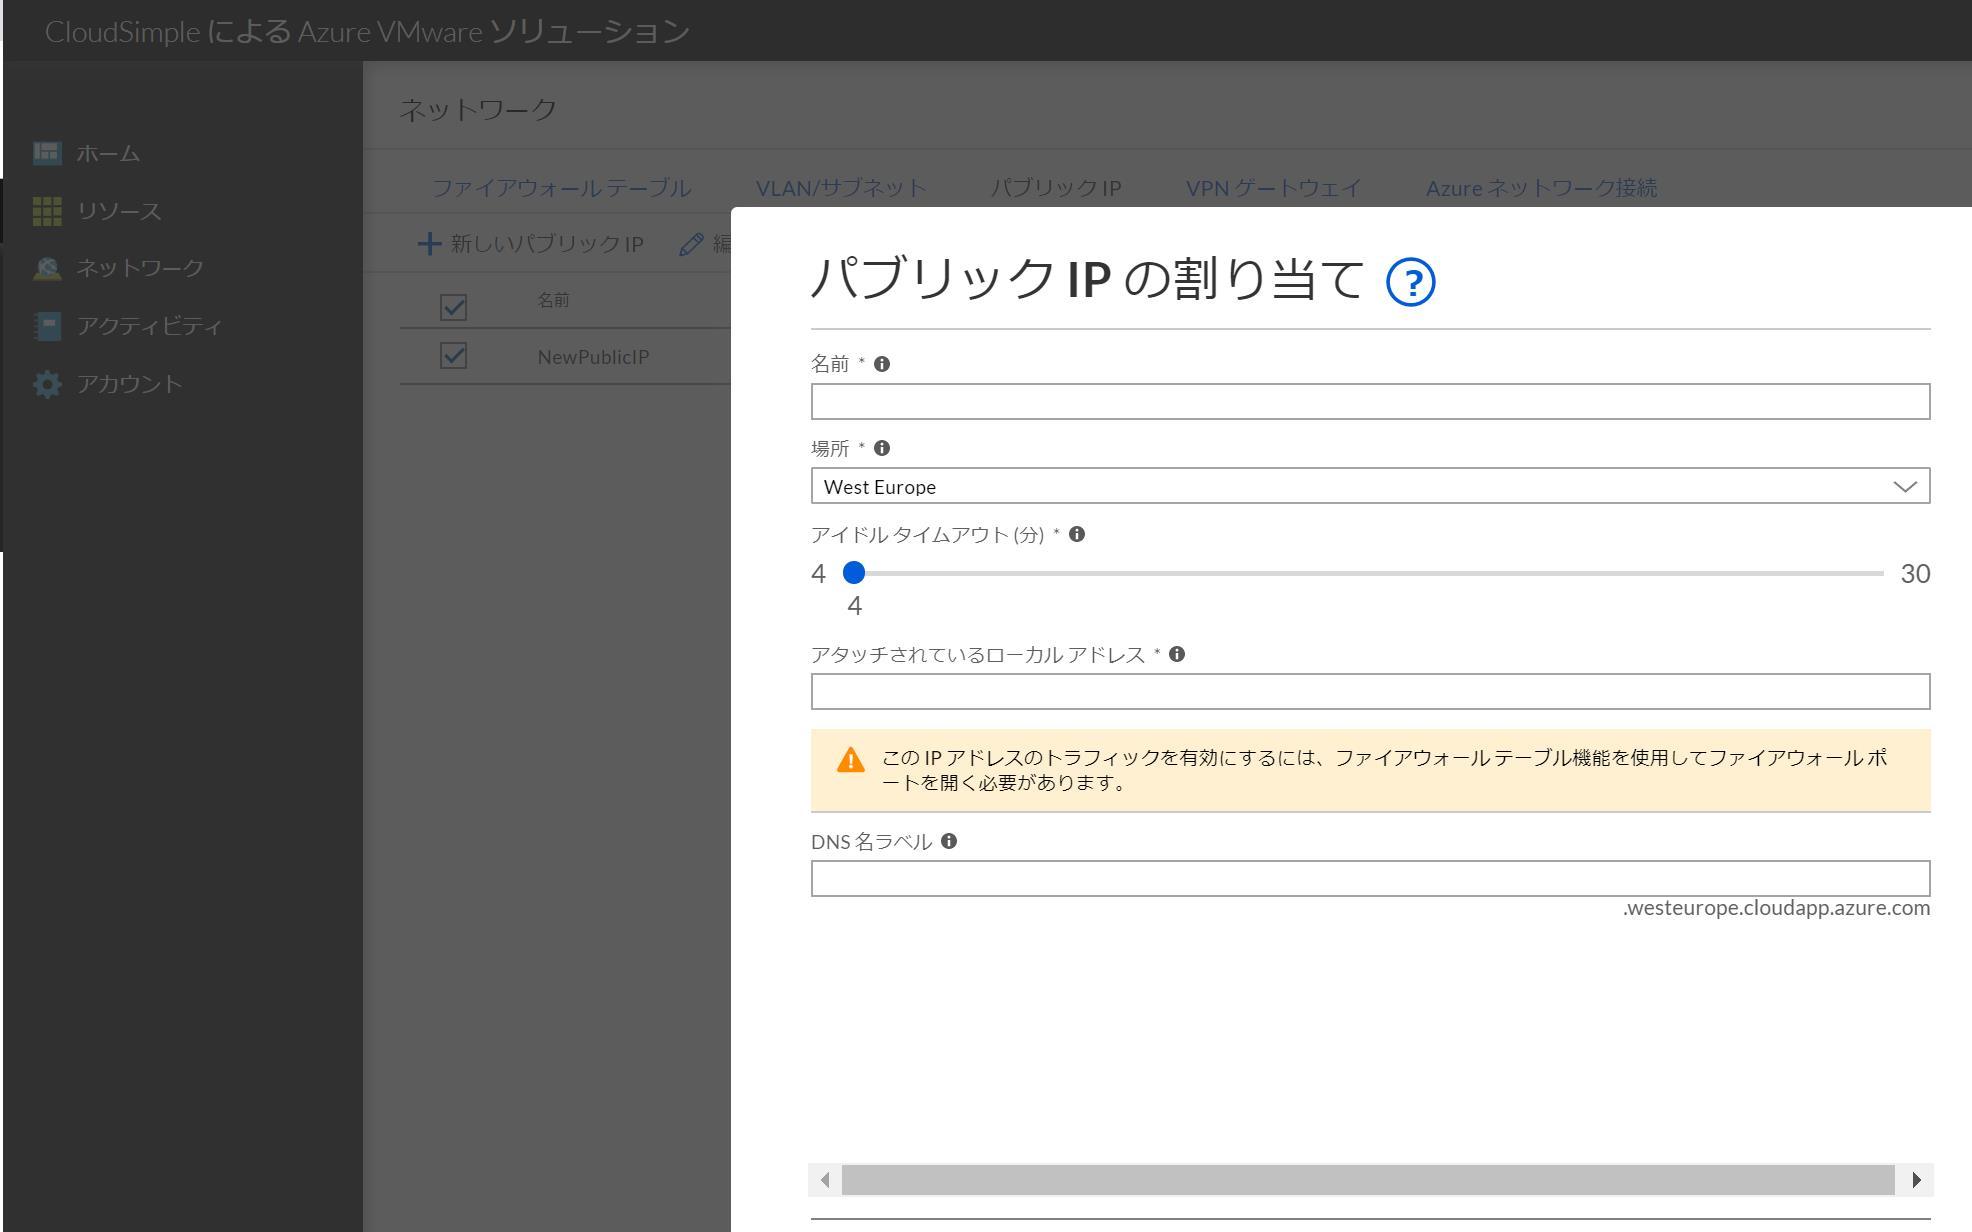 Azure VMware SolutionのCloudSimpleポータルでパブリックIPアドレスを確保するところ